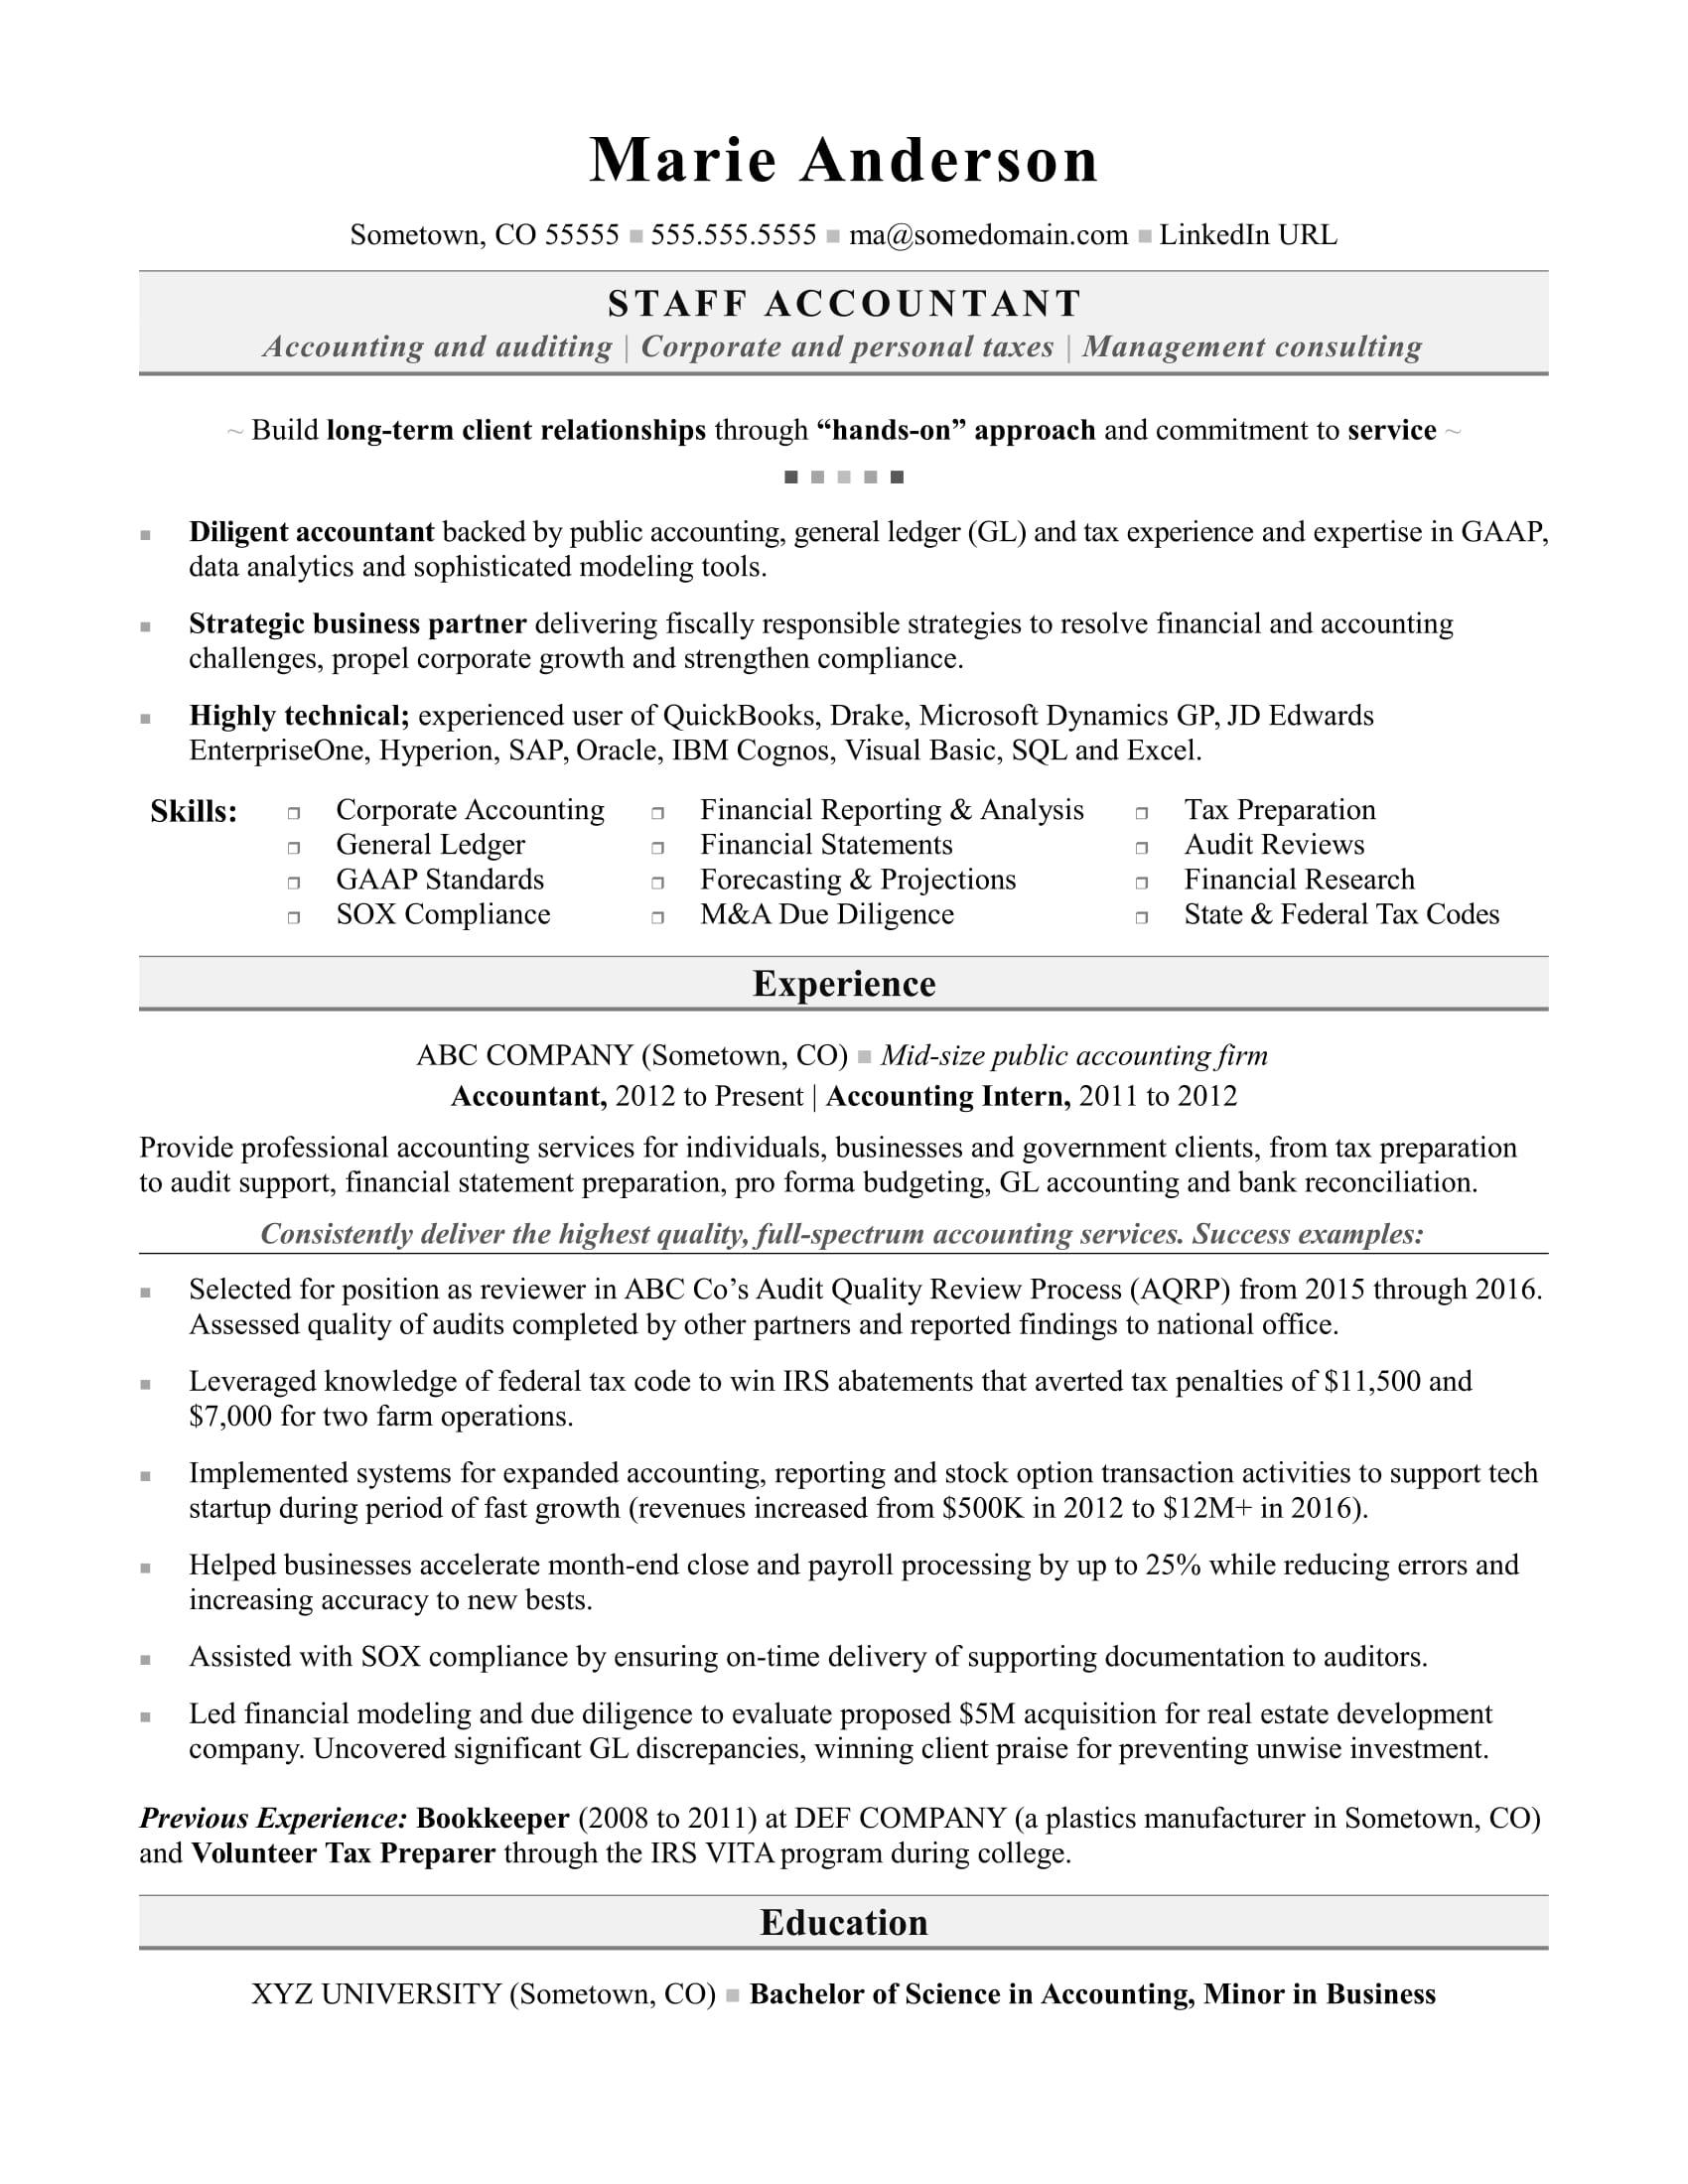 cv format for bank job in nepal